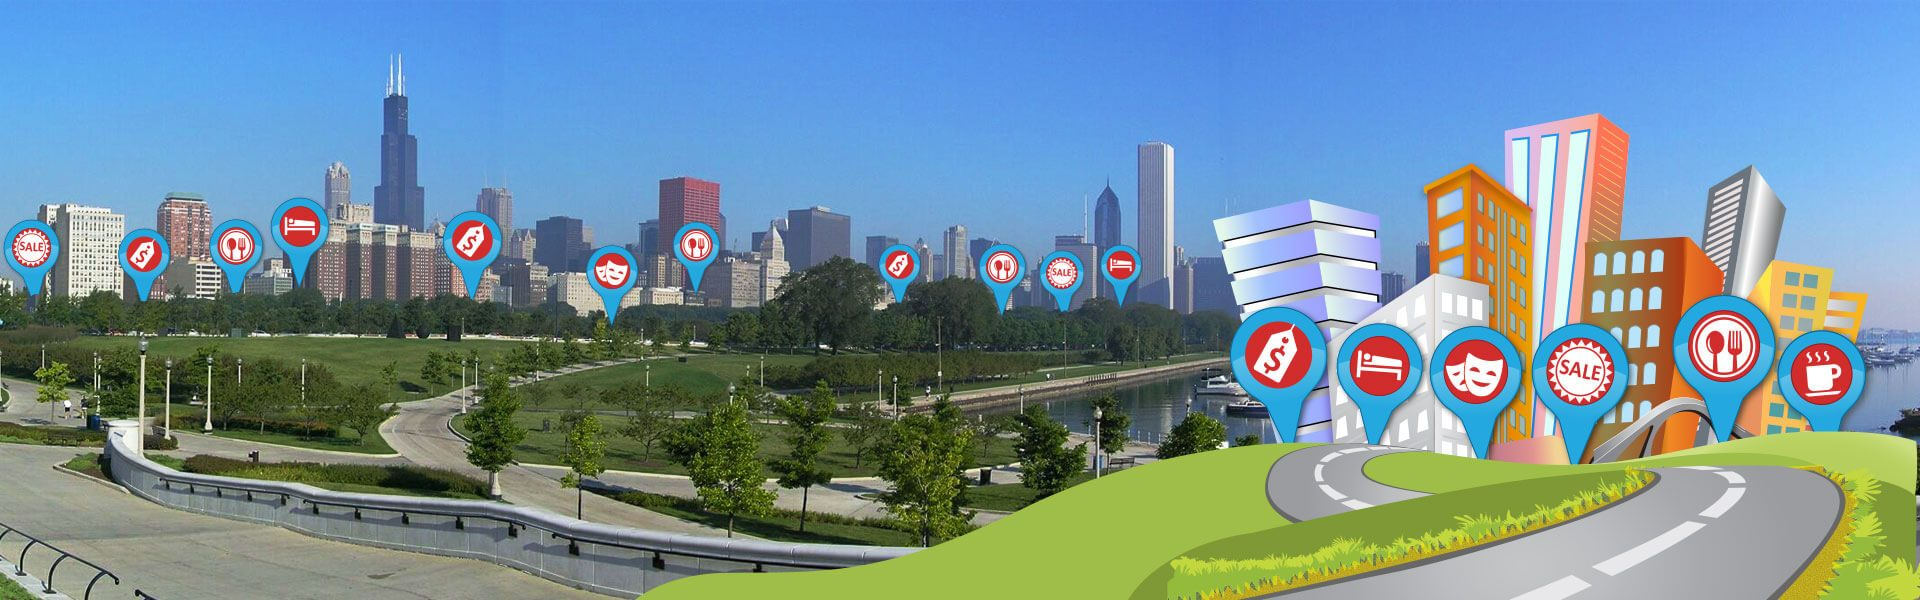 Banner-City-3G